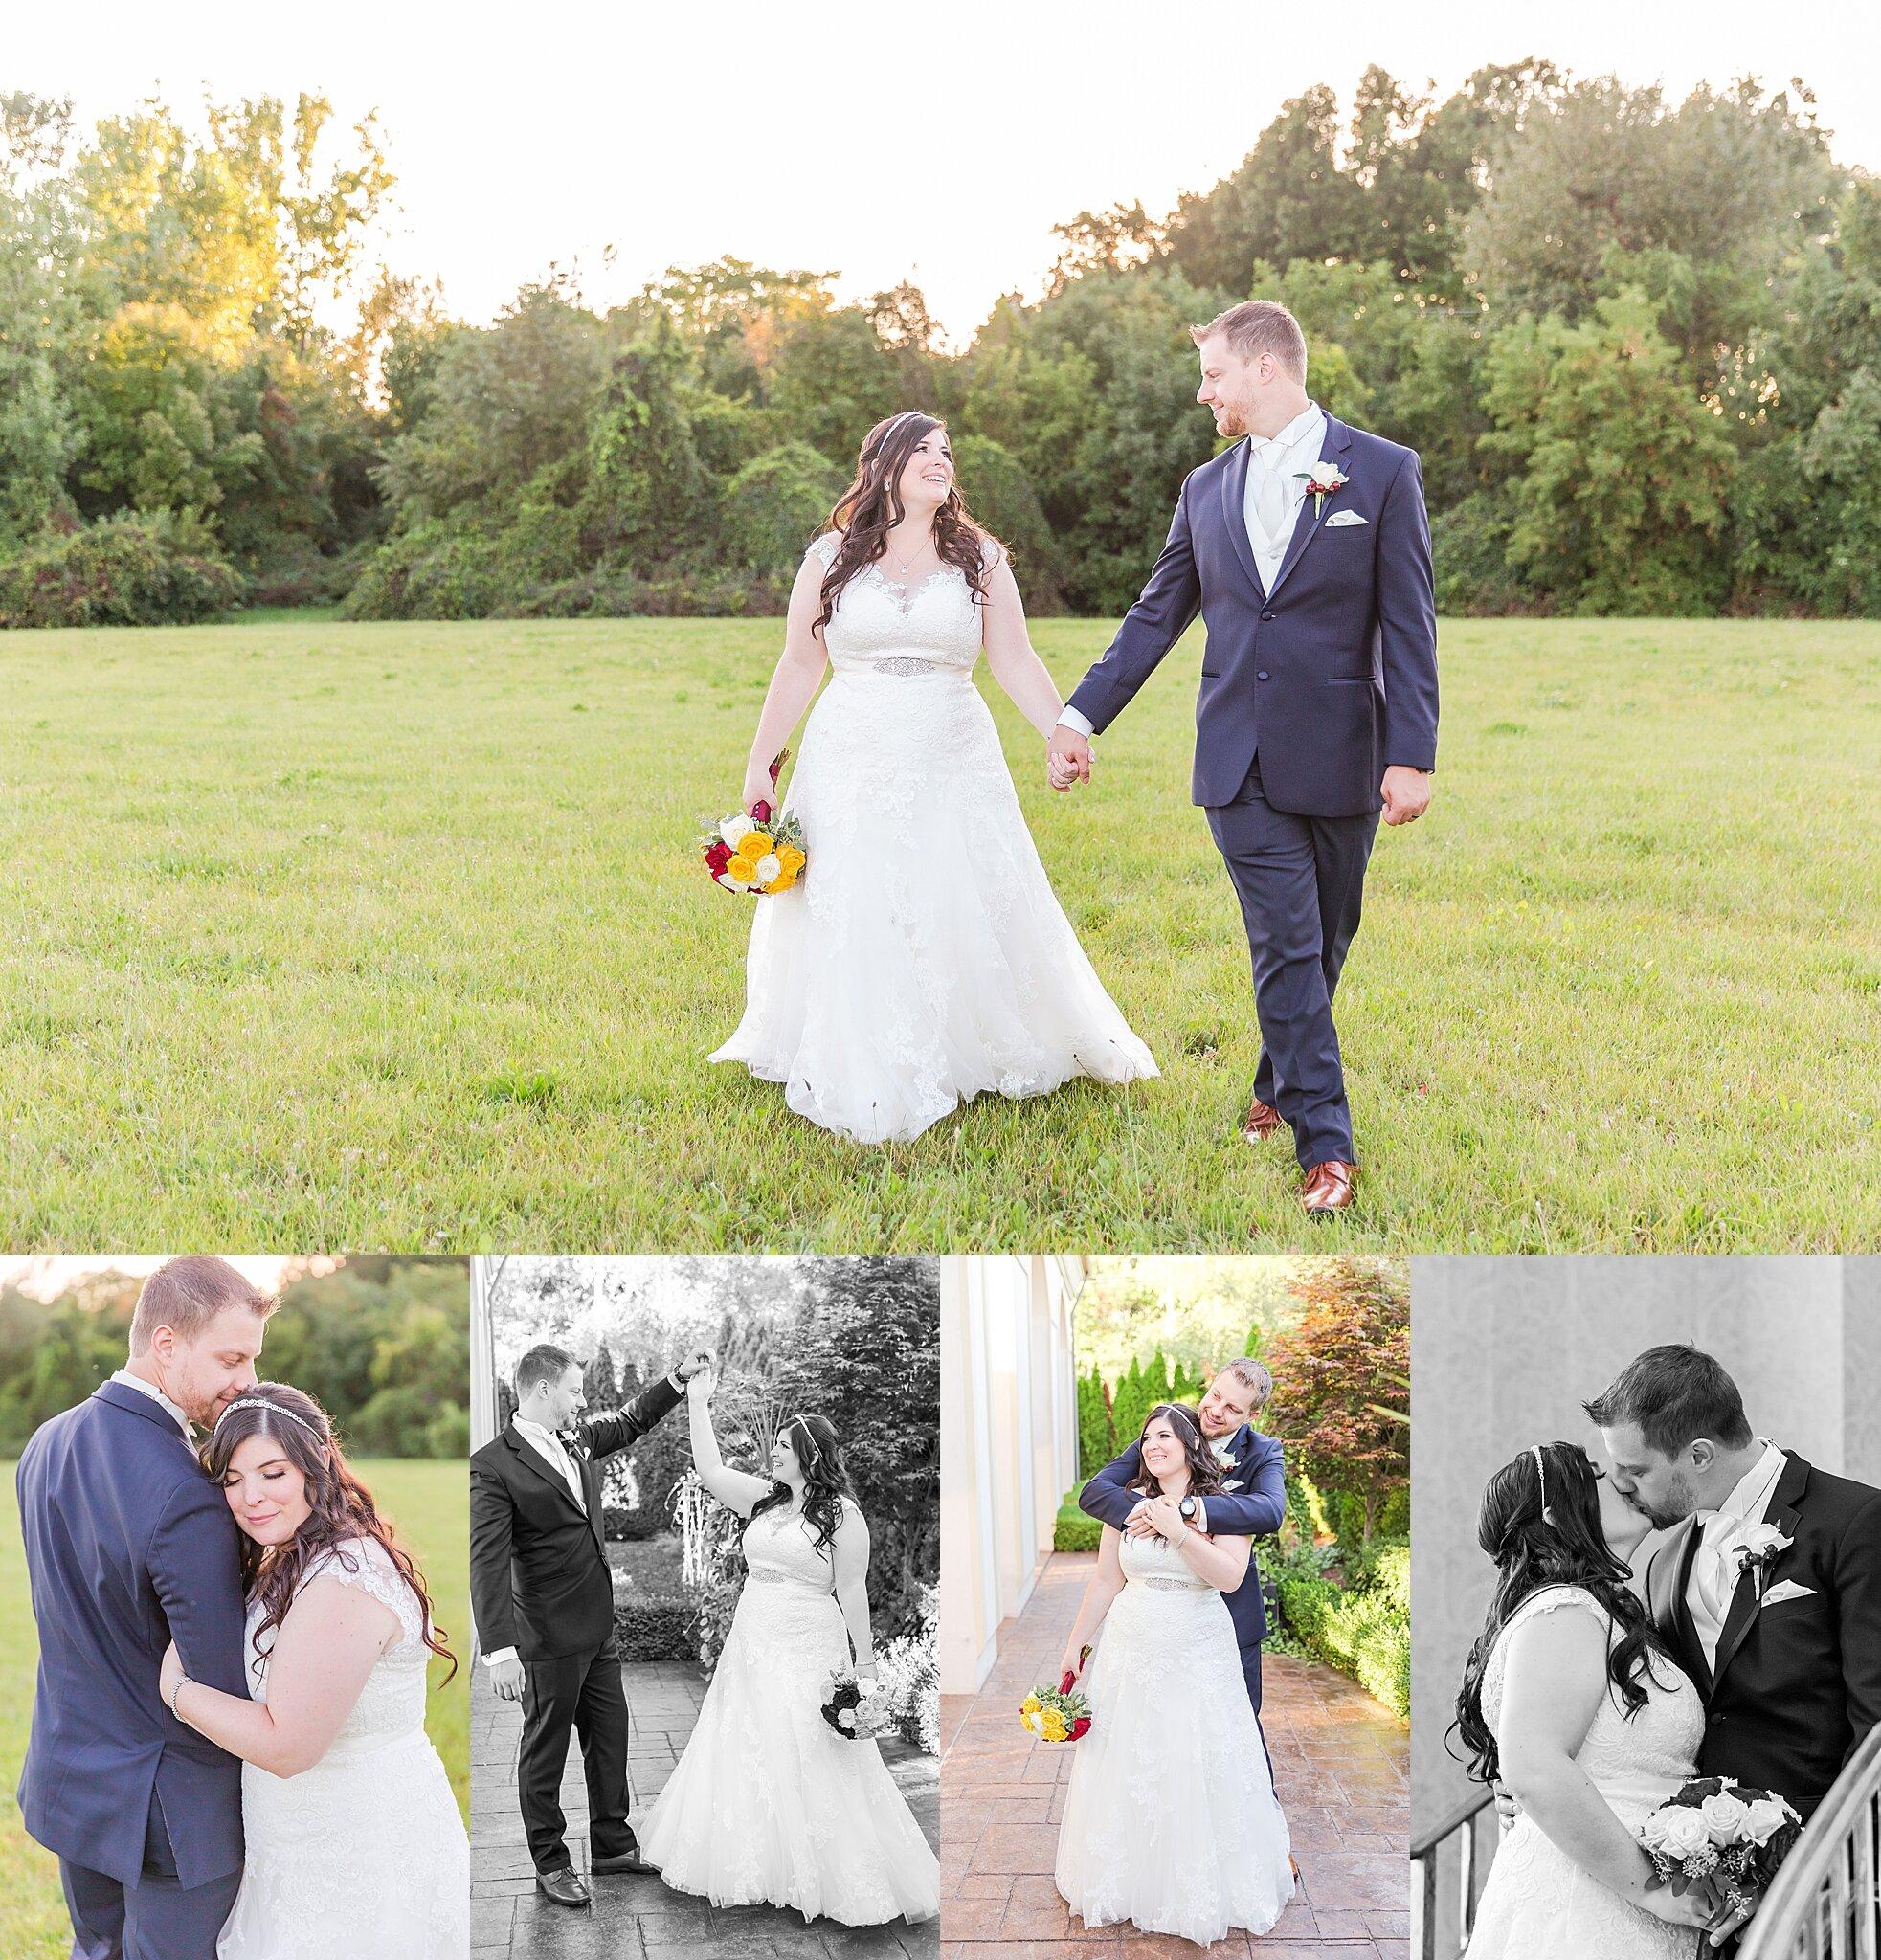 detroit-wedding-photographer-open-air-chapel-crystal-gardens-howell-kim-mark-by-courtney-carolyn-photography_0126.jpg